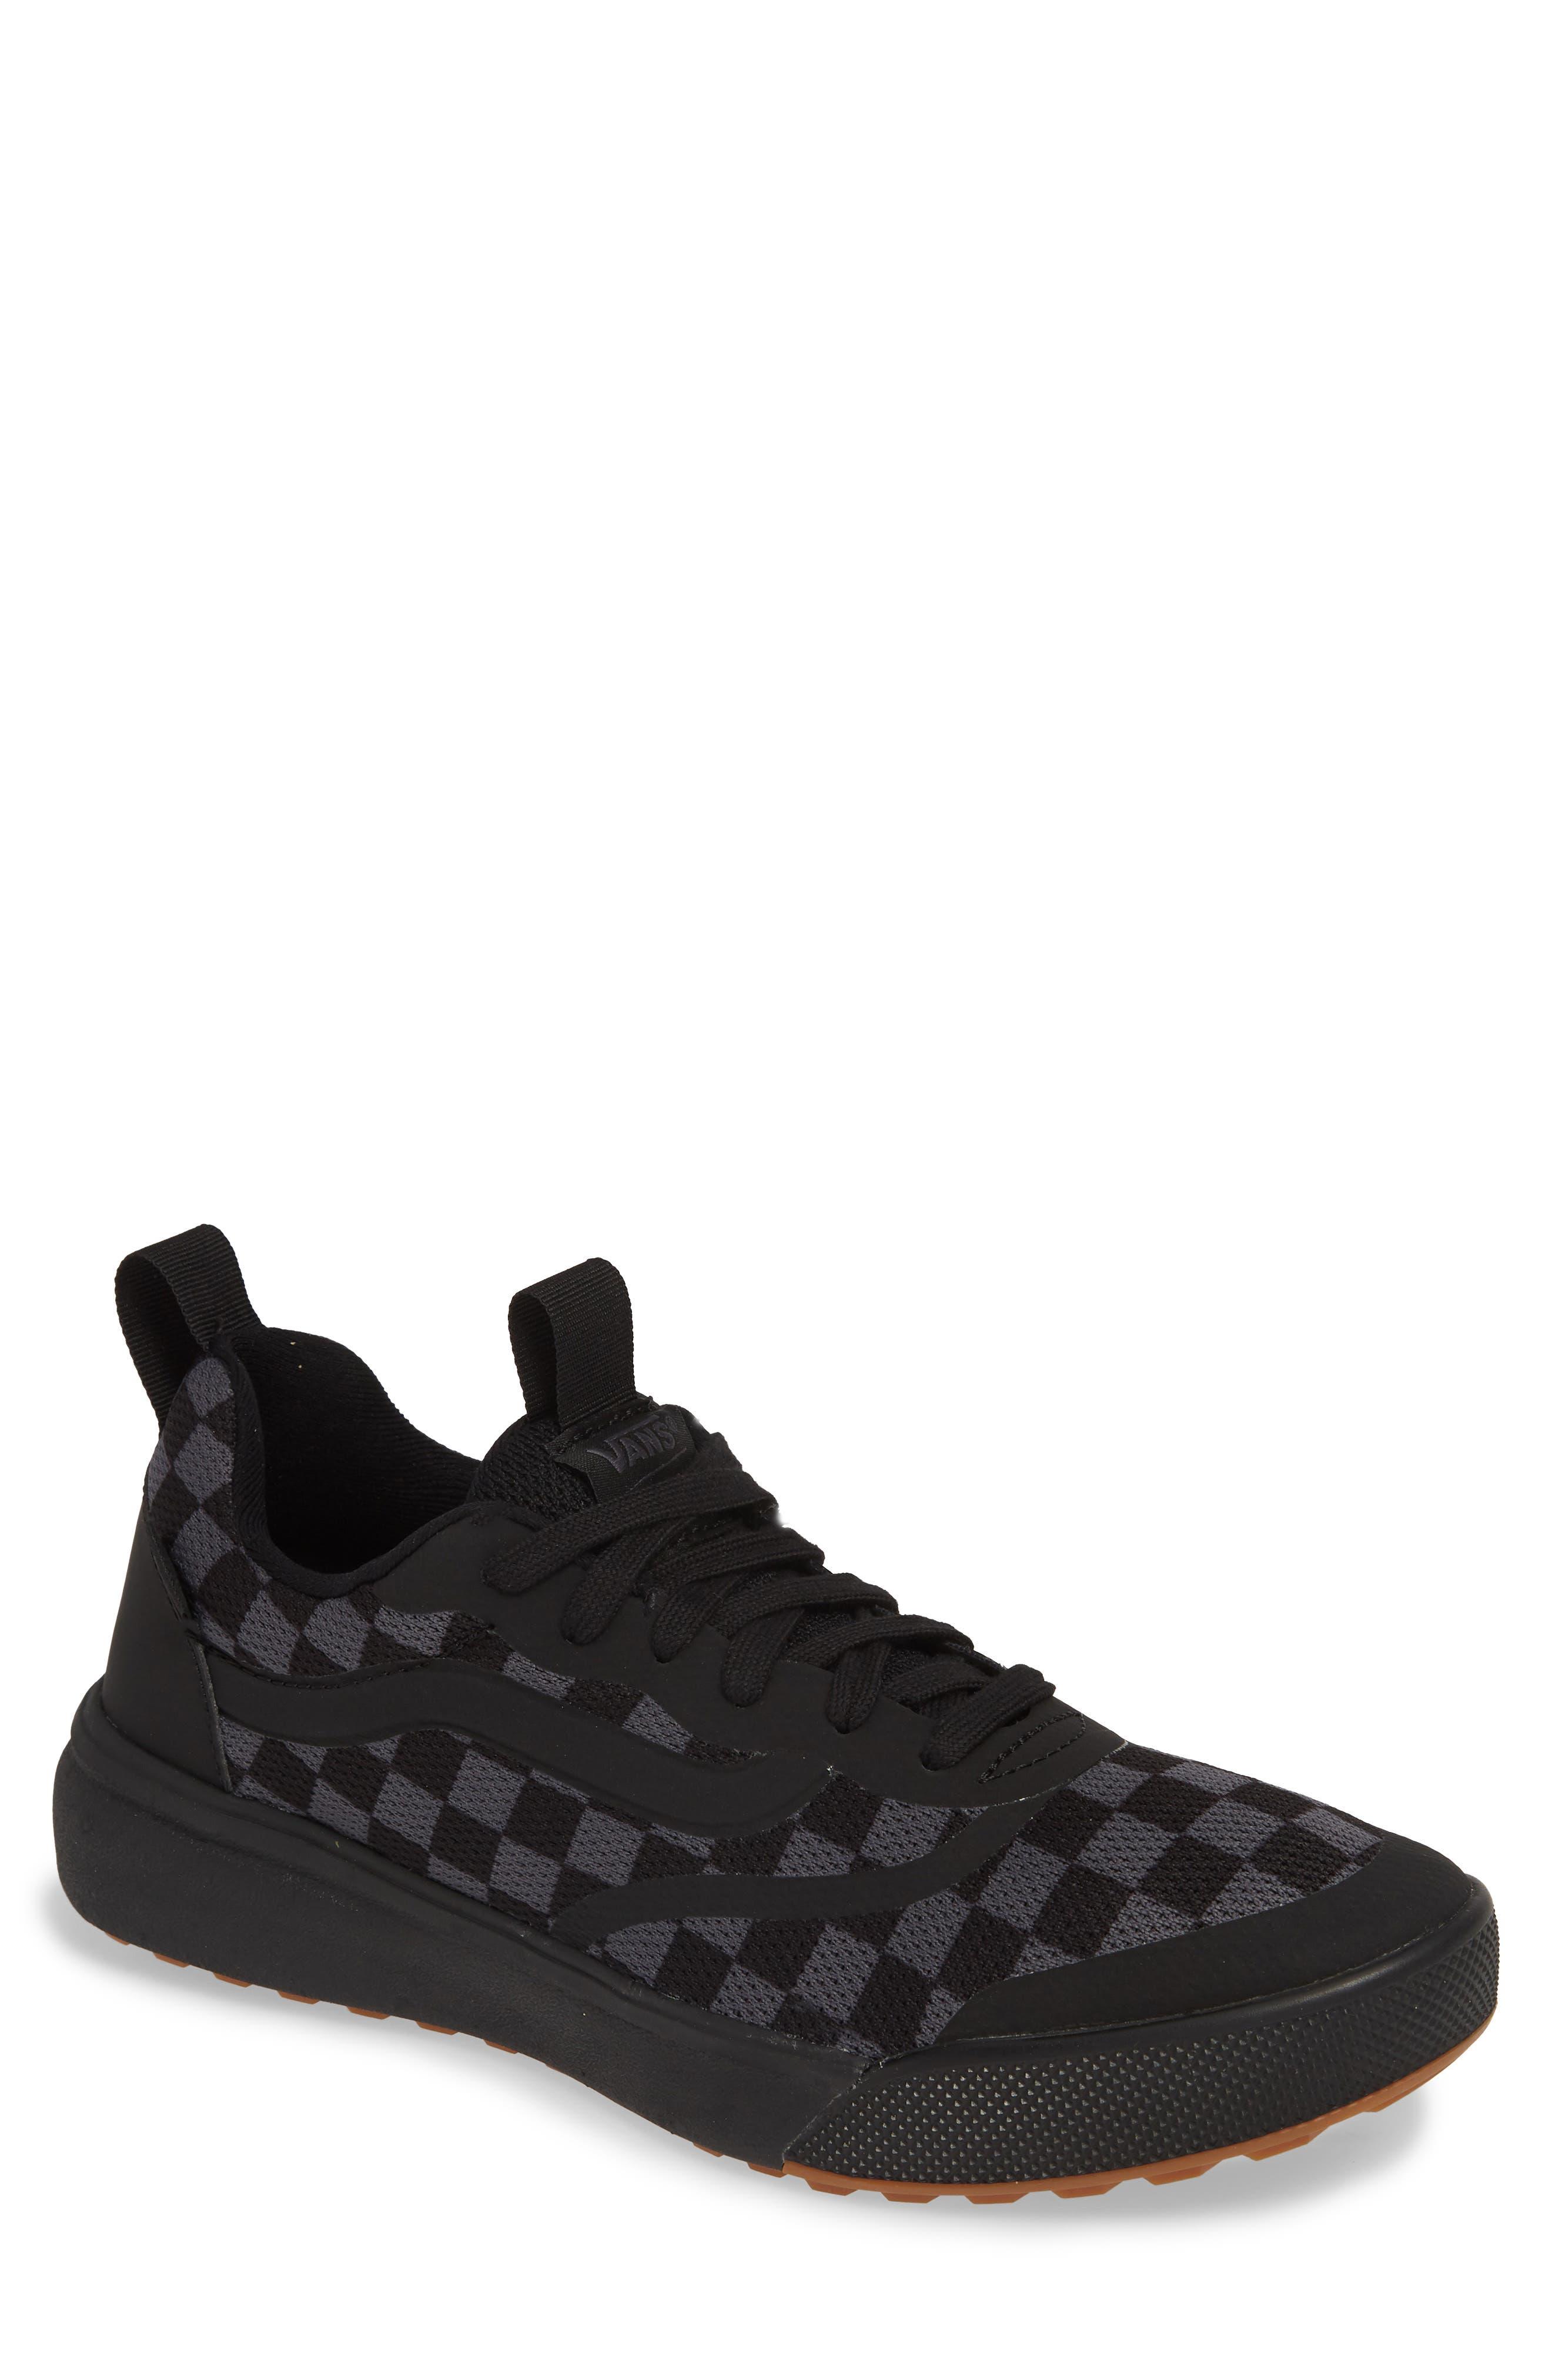 VANS,                             UltraRange Rapidwield Sneaker,                             Main thumbnail 1, color,                             003